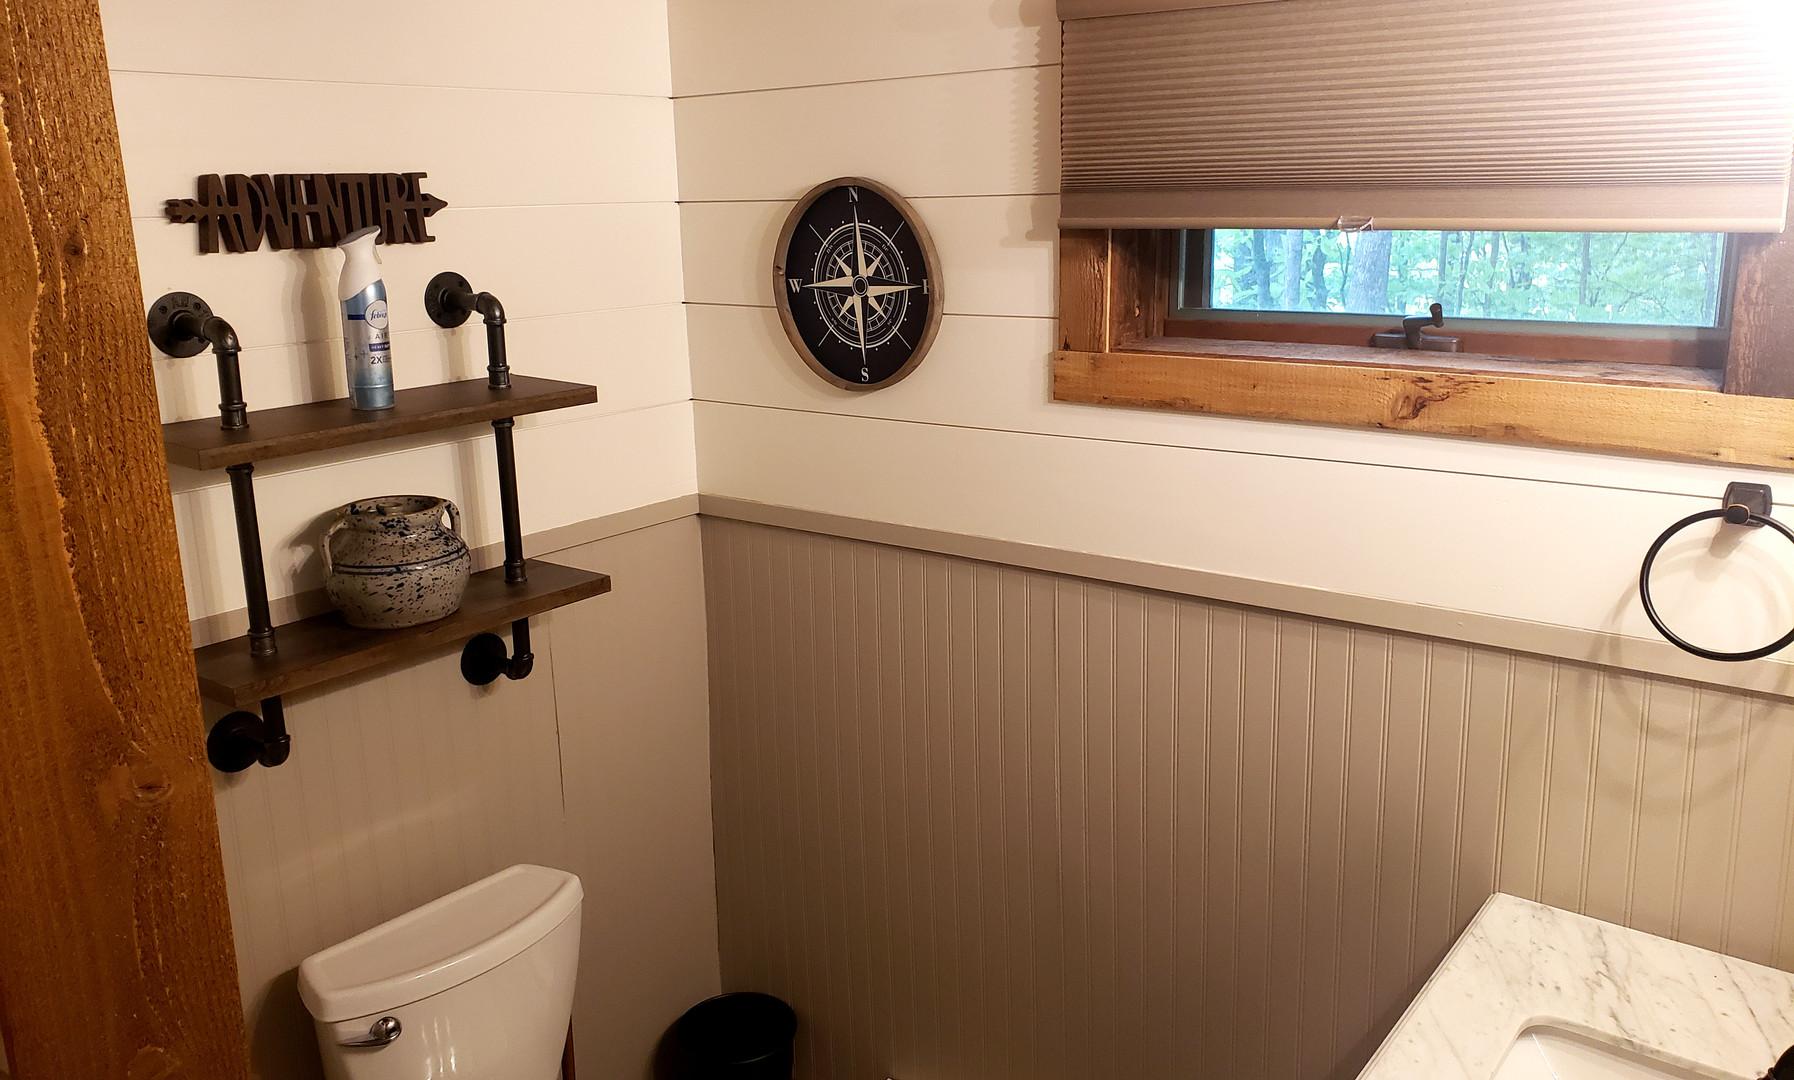 dorf basement bath 1.jpg